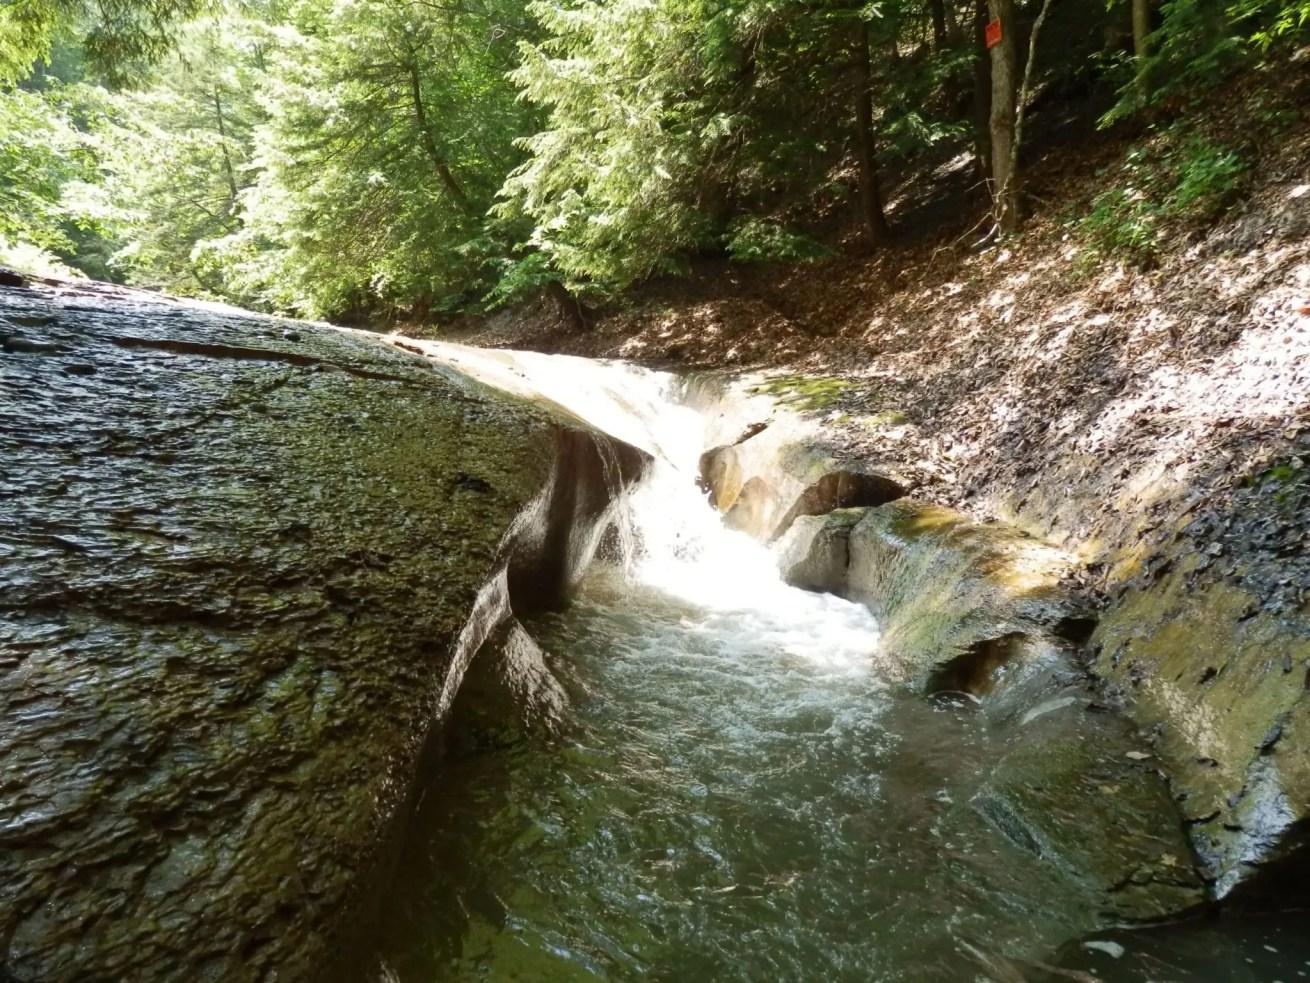 Bathtub Falls, Onondaga County, New York